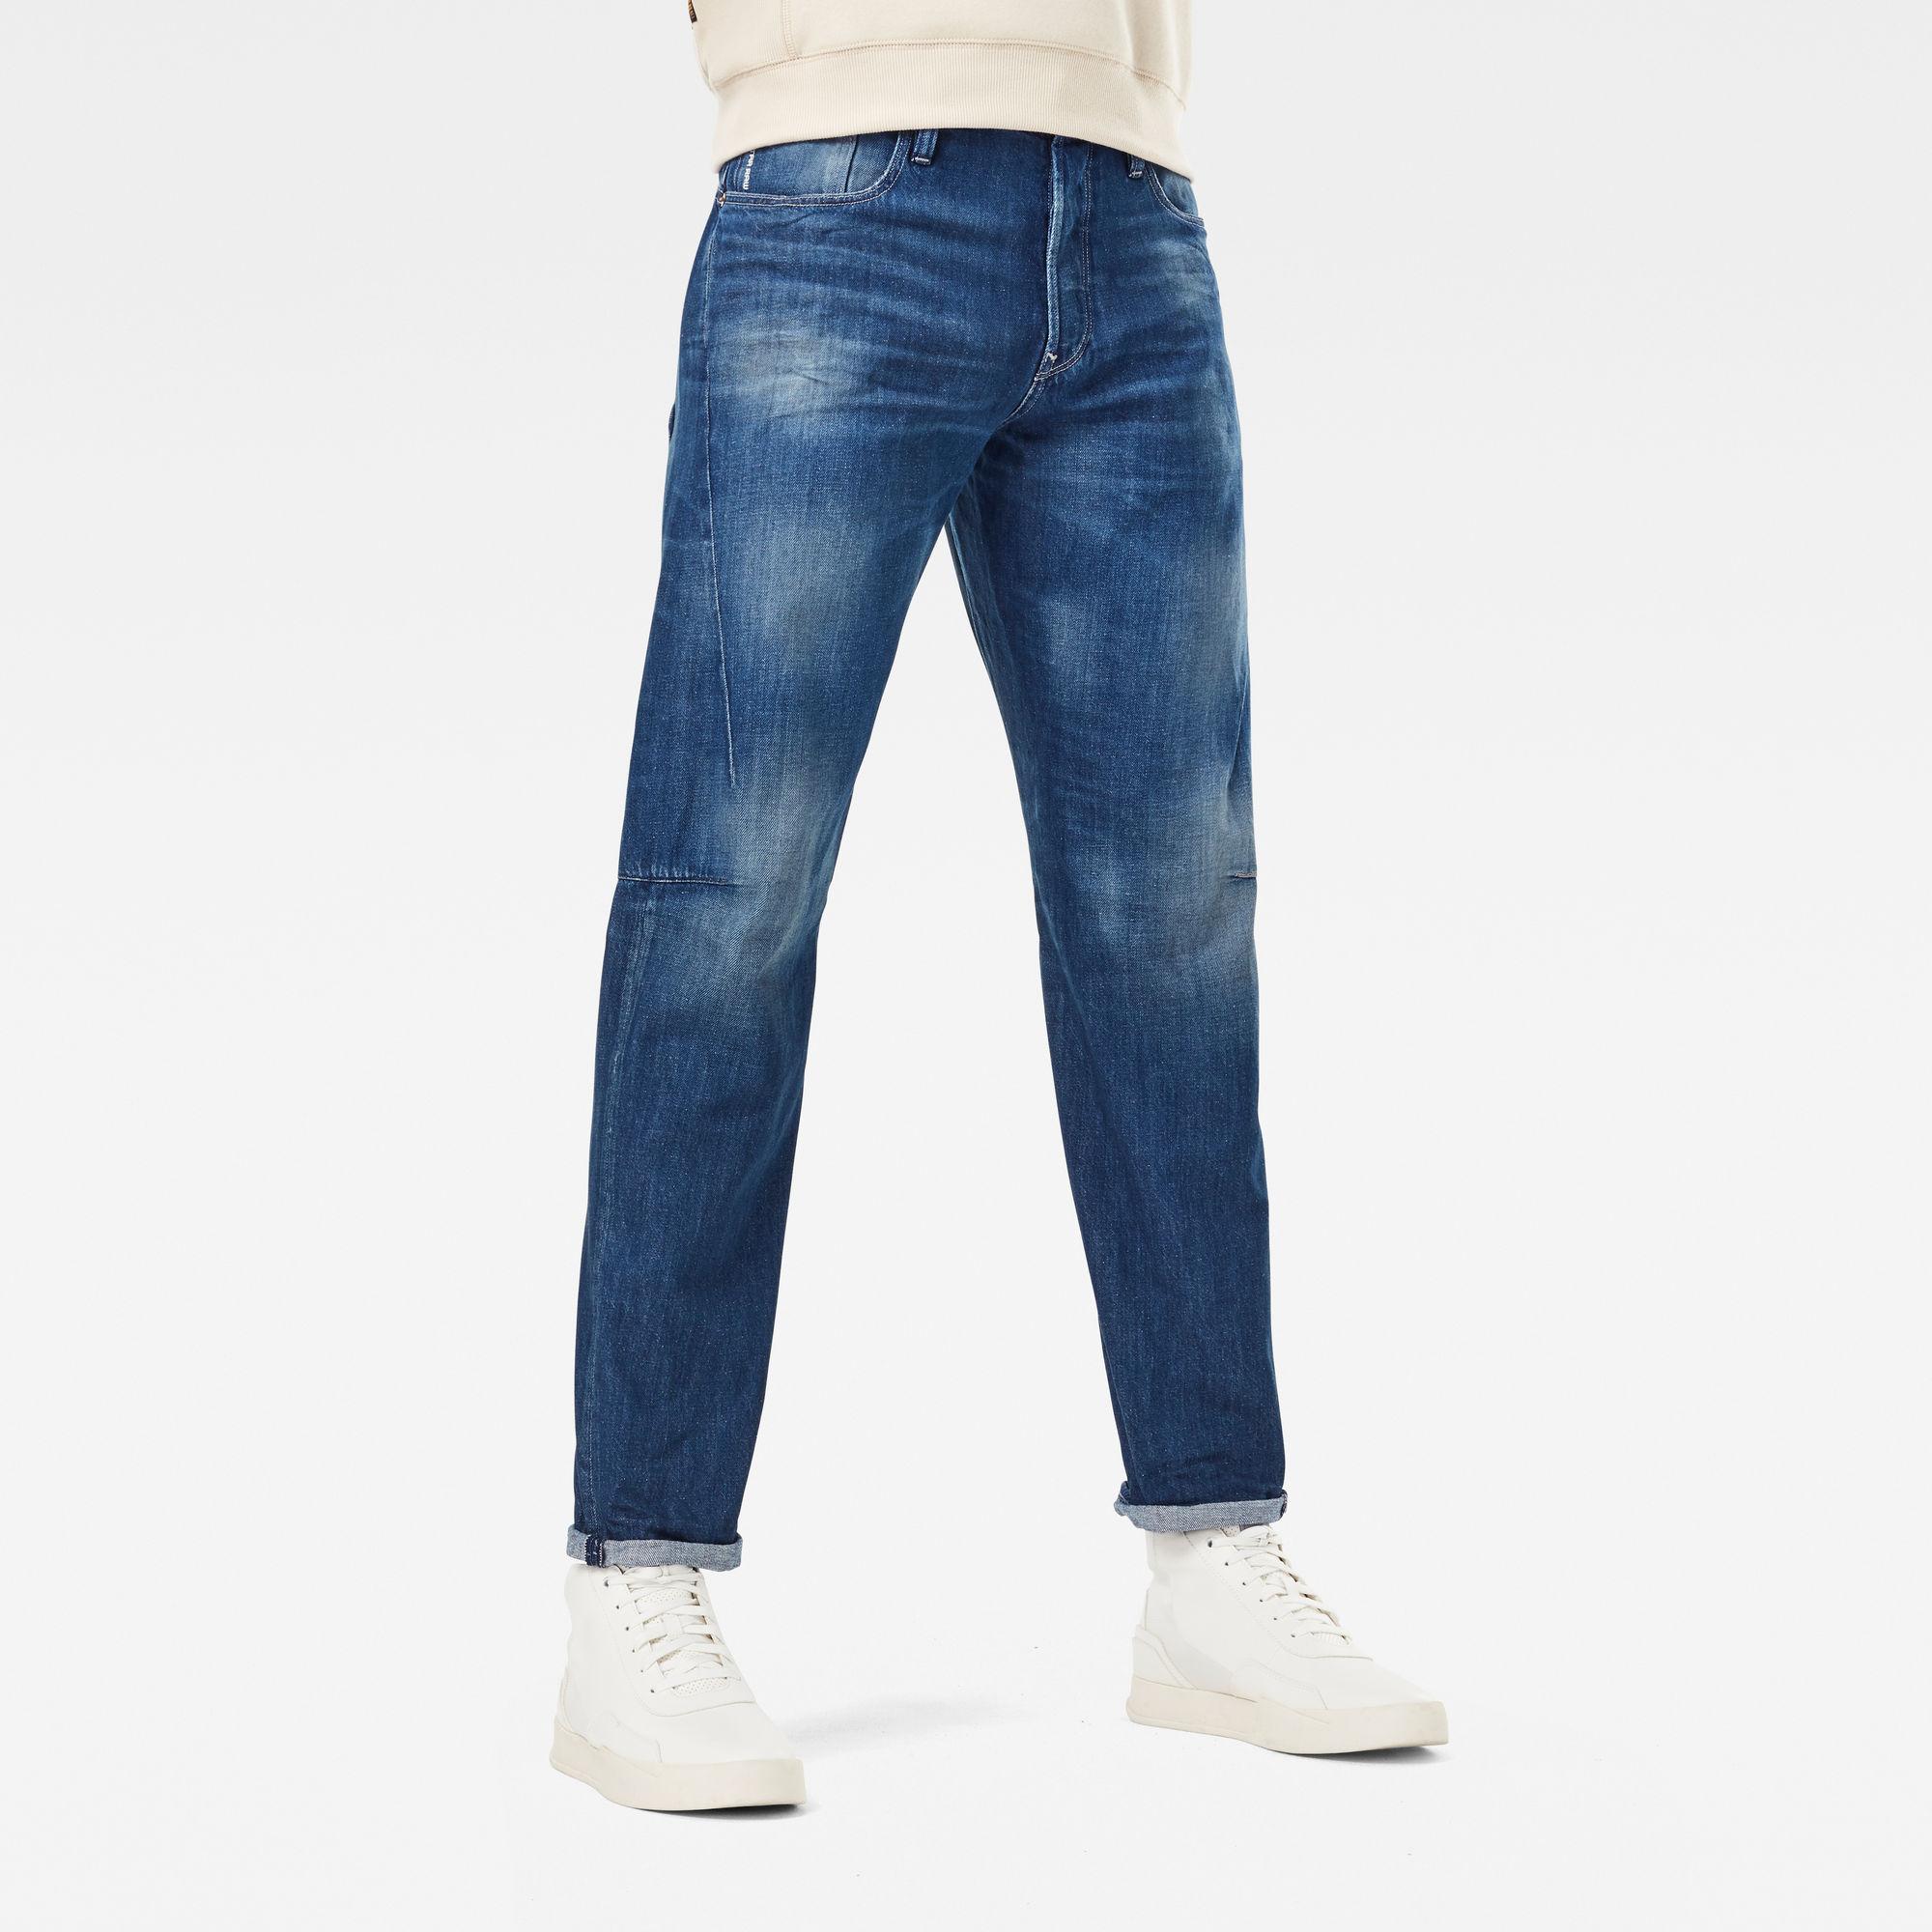 G-Star RAW Heren Scutar 3D Tapered Jeans C Blauw